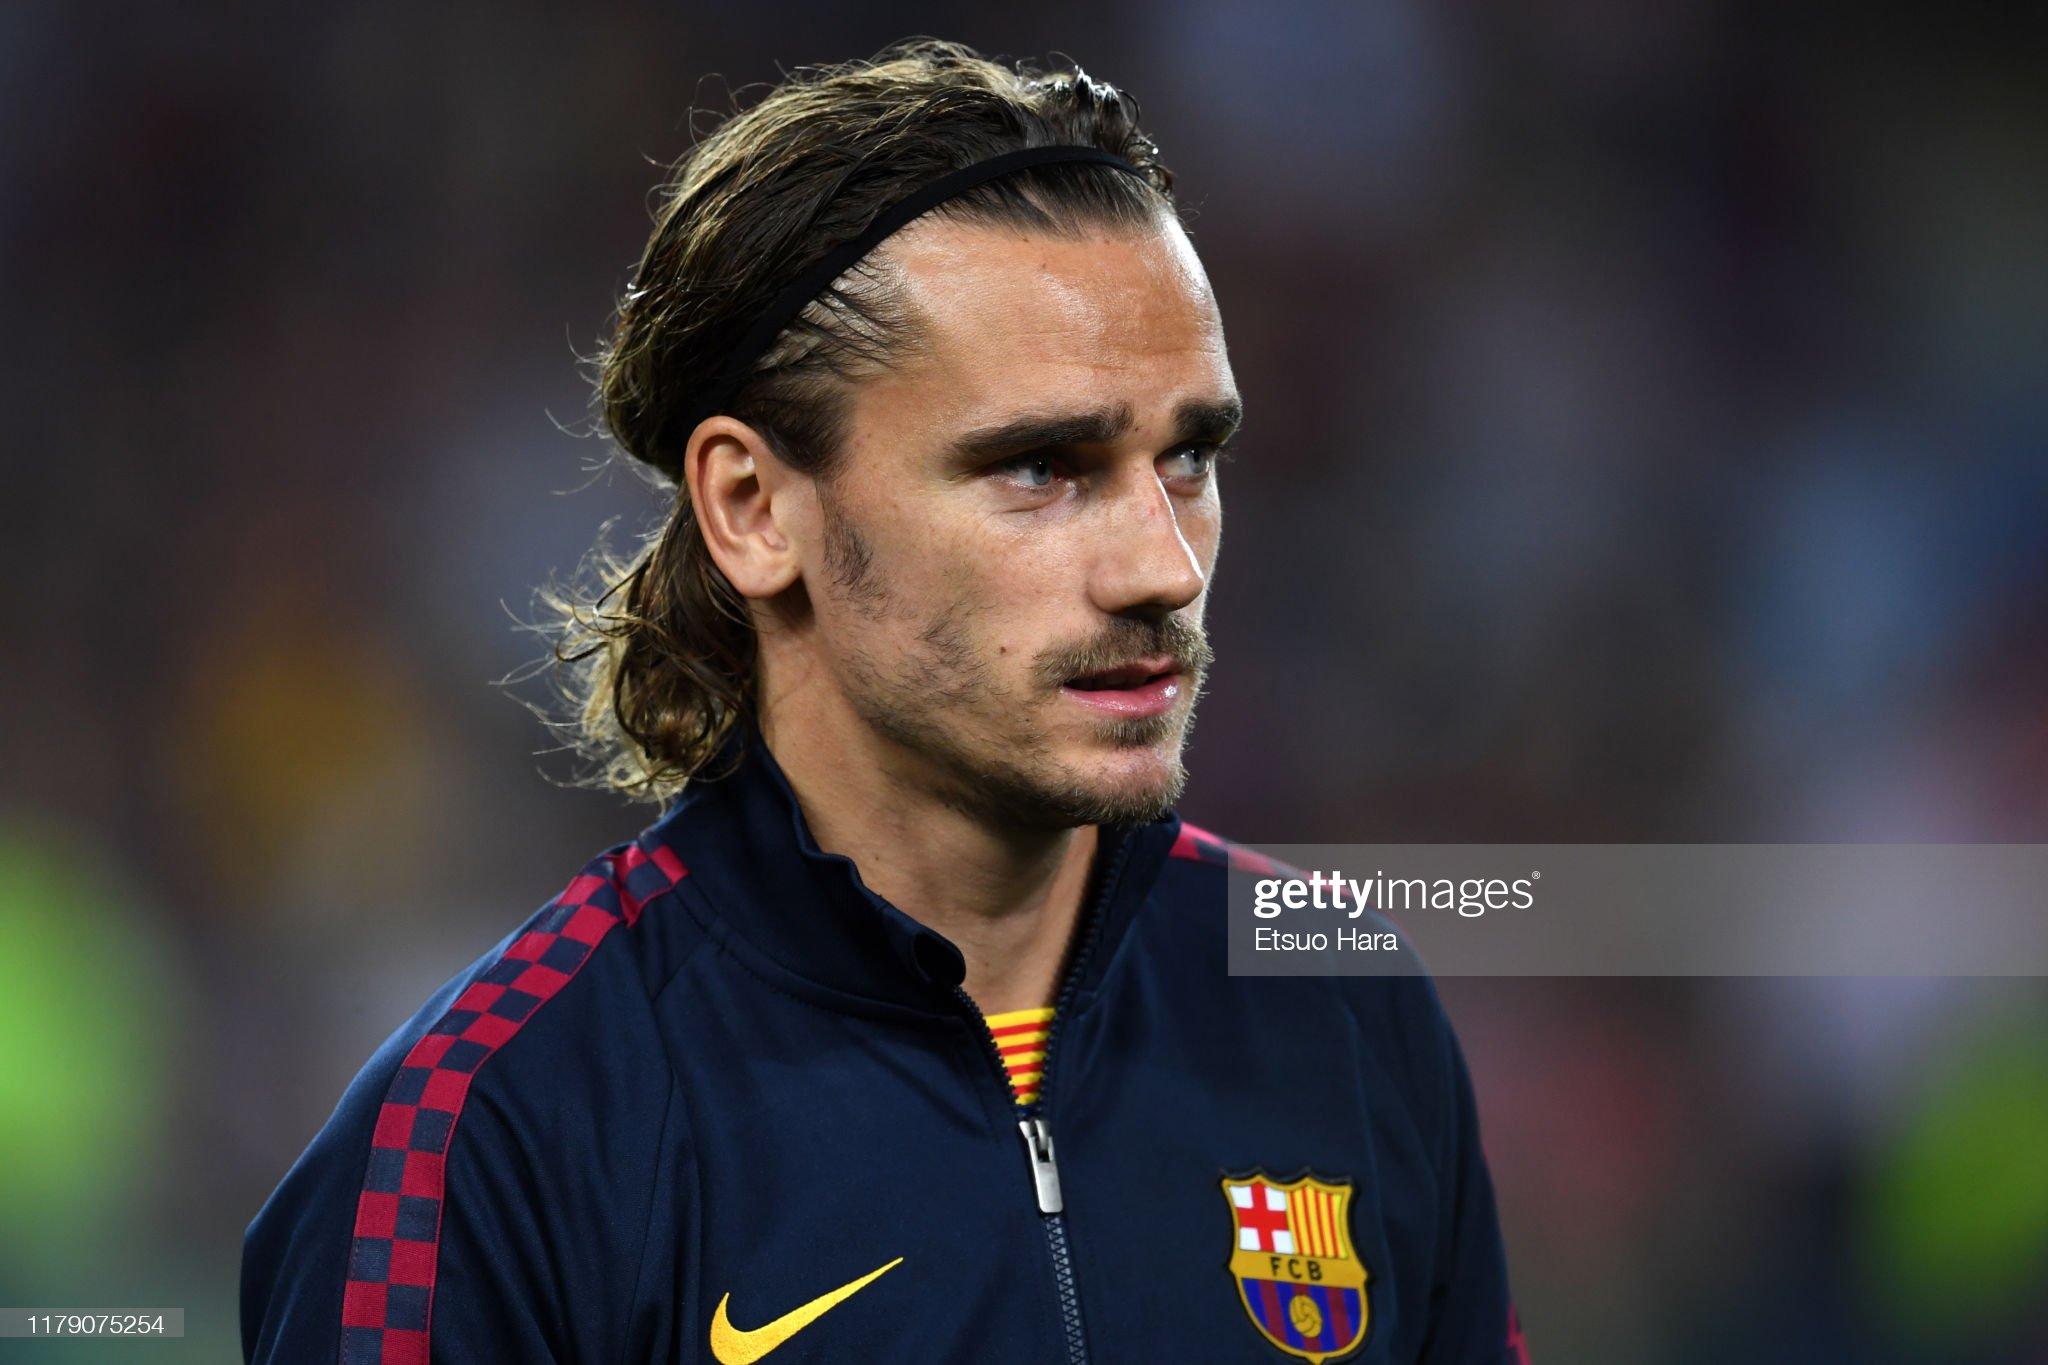 صور مباراة : برشلونة - إنتر 2-1 ( 02-10-2019 )  Antoine-griezmann-of-fc-barcelona-looks-on-prior-to-the-uefa-league-picture-id1179075254?s=2048x2048